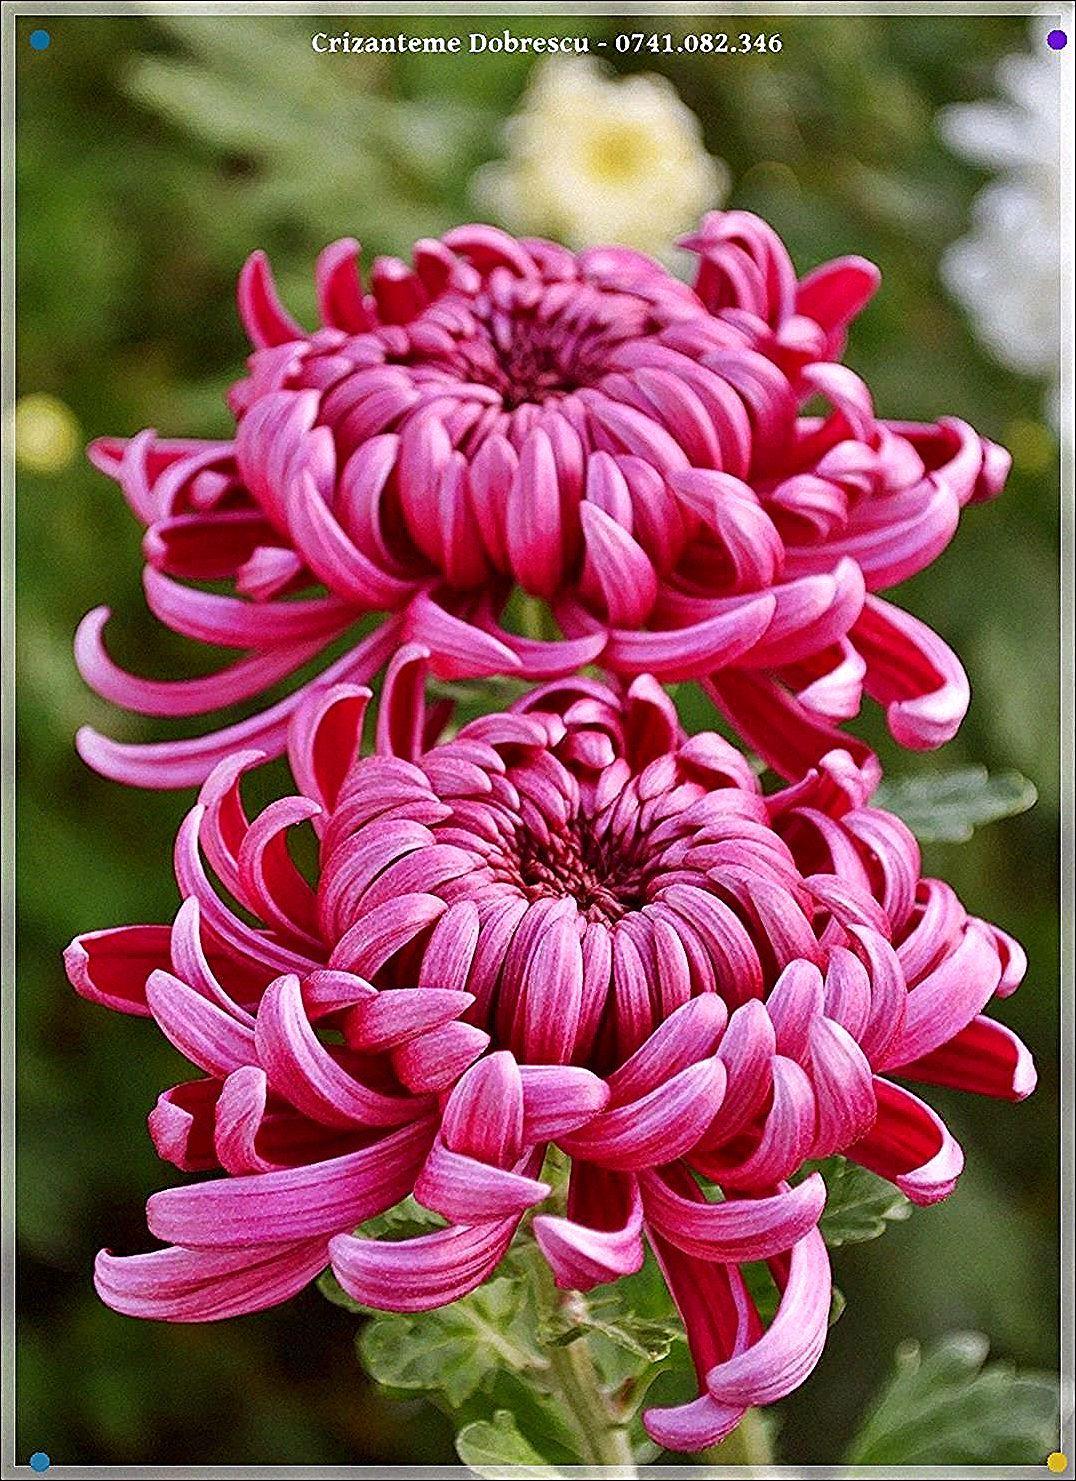 Chrysantheme Tatouage In 2020 Chrysanthemum Flower Garden Flower Beds Flowers Nature